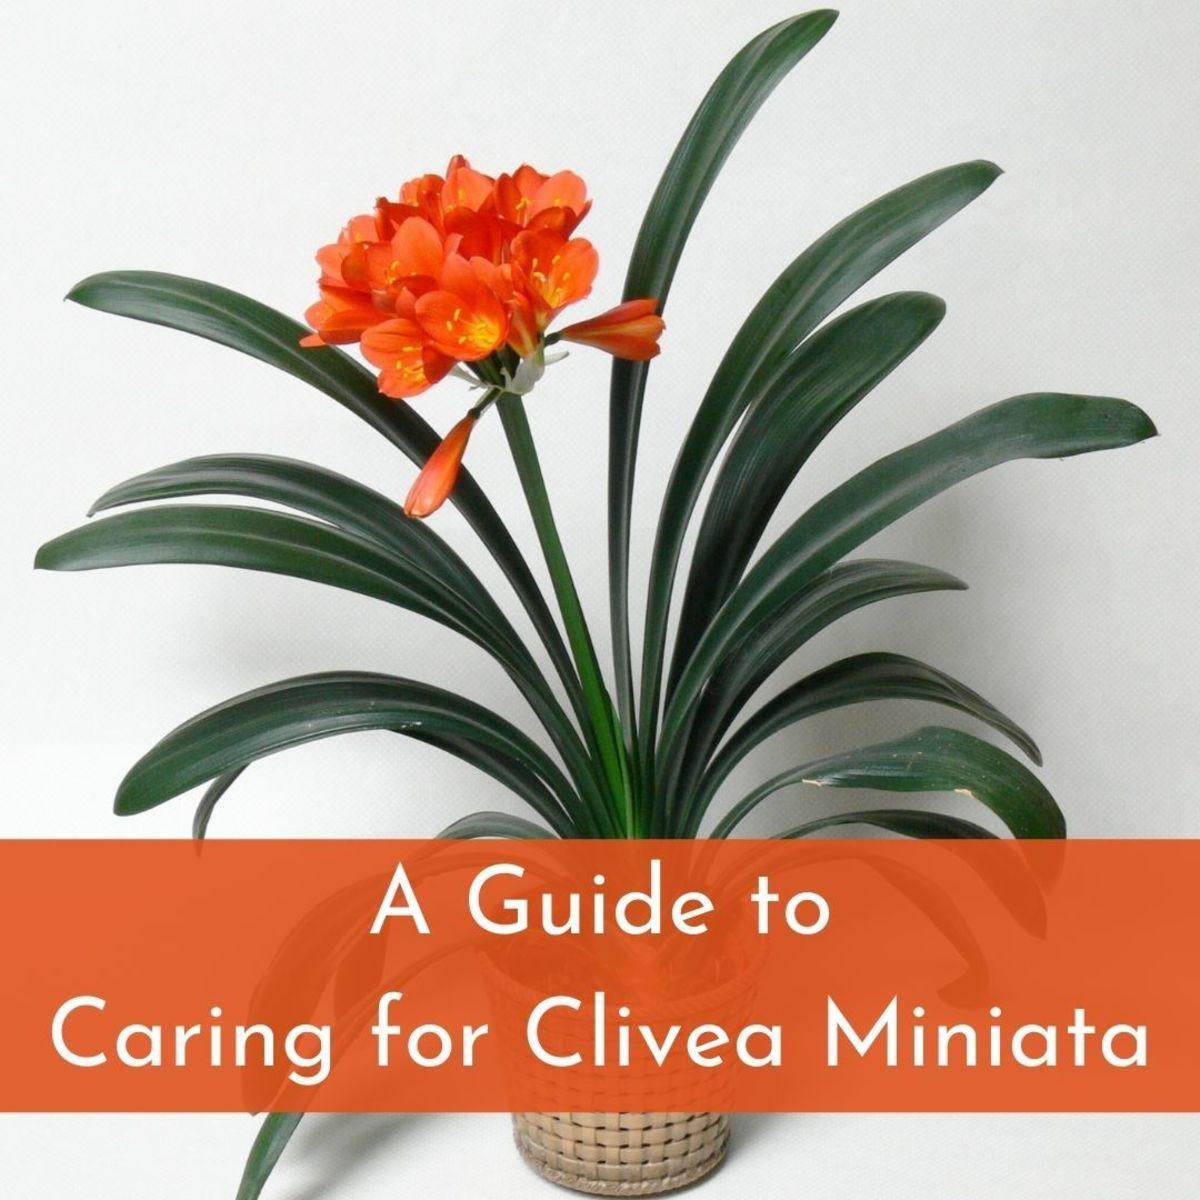 clivea-miniata-an-easy-care-flowering-houseplant